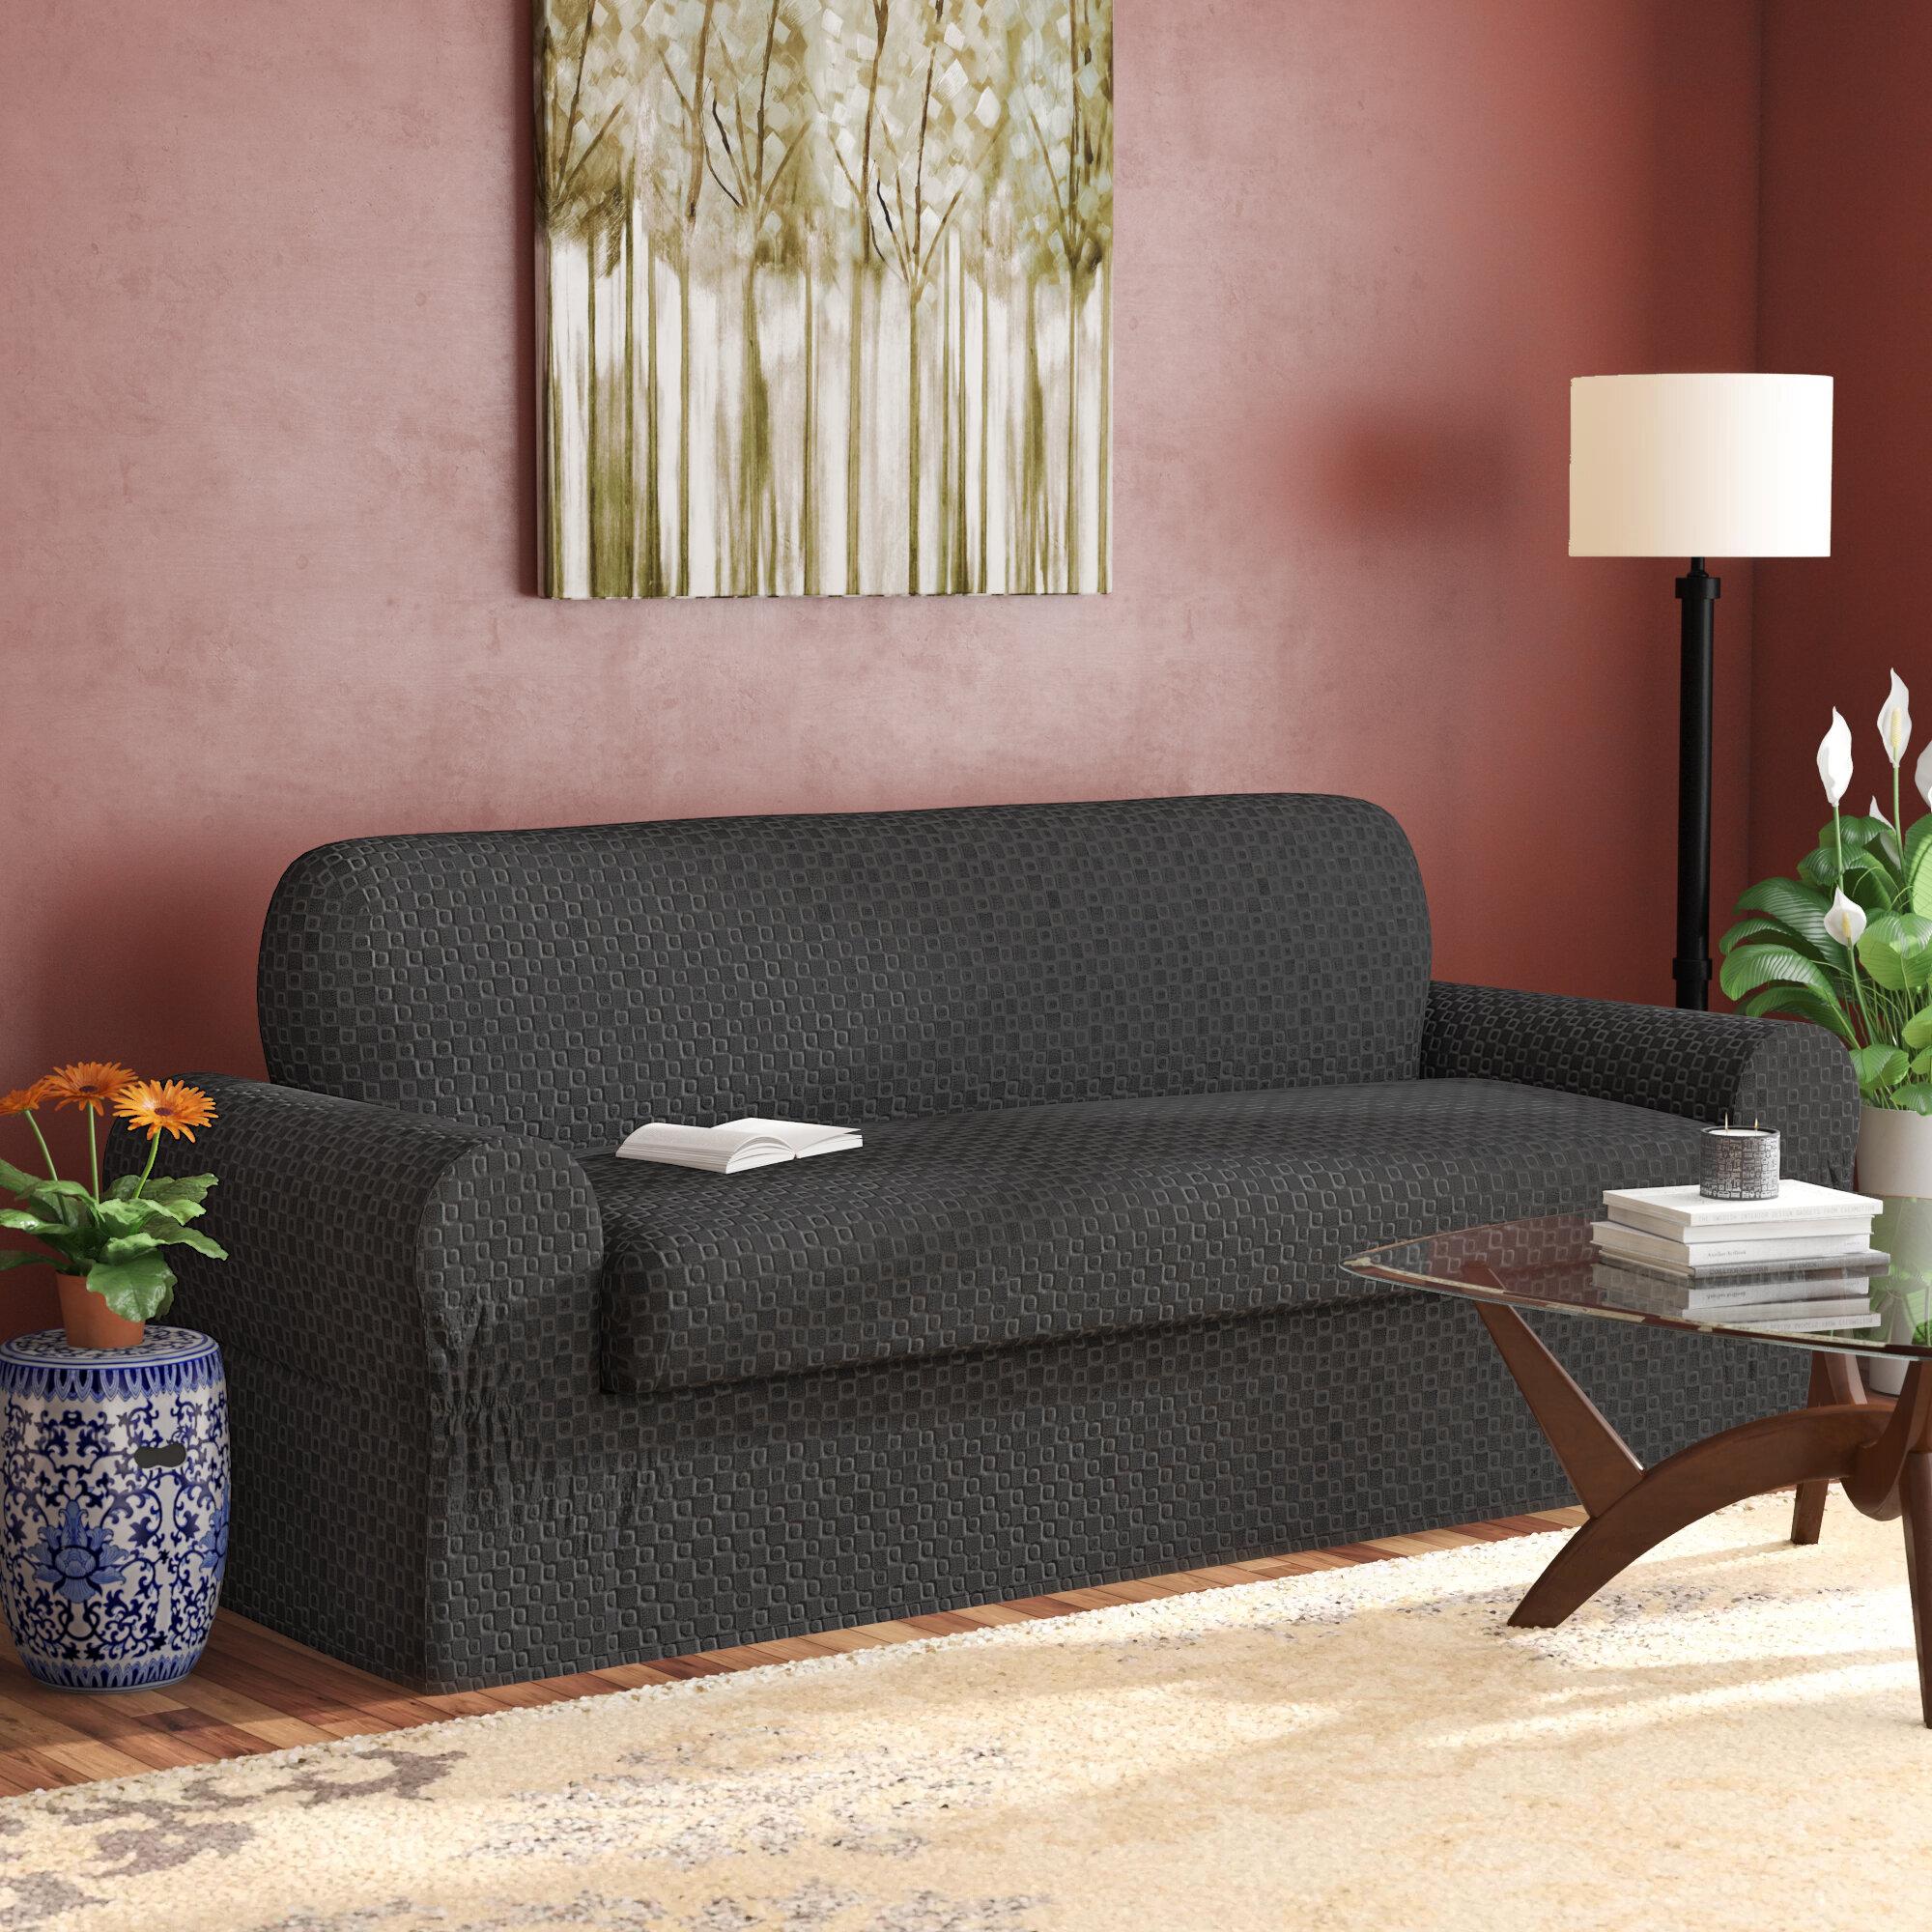 Darby Home Co Box Cushion Sofa Slipcover & Reviews | Wayfair